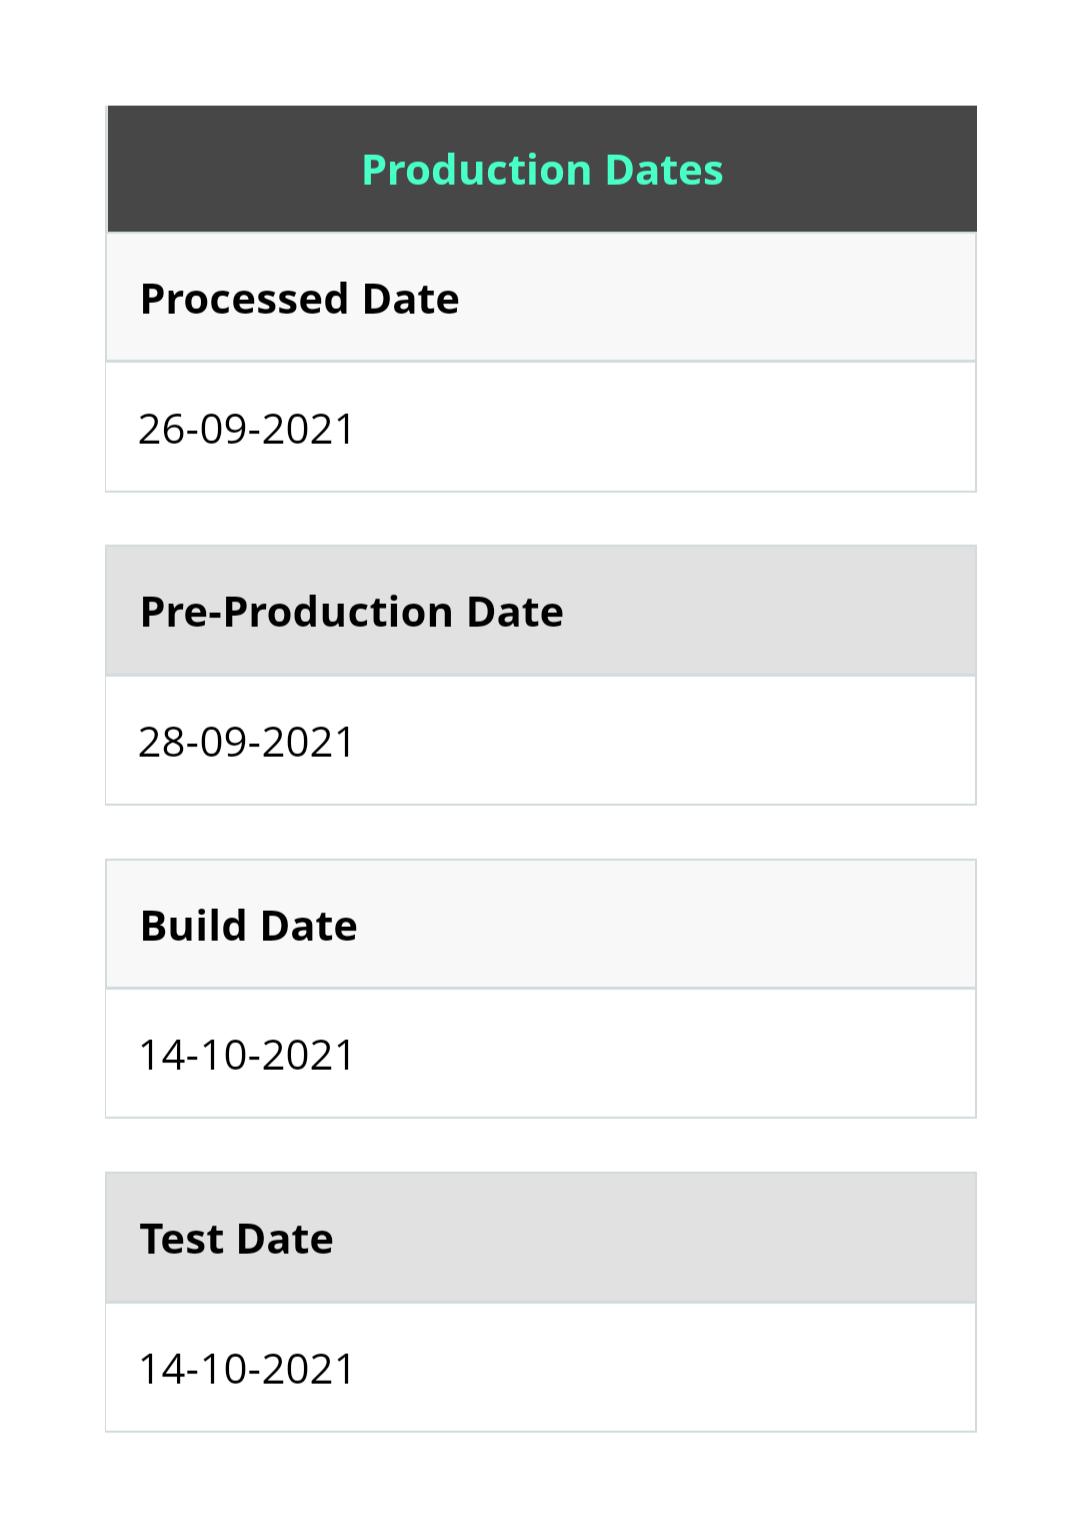 Screenshot_20211014-150528-560.png